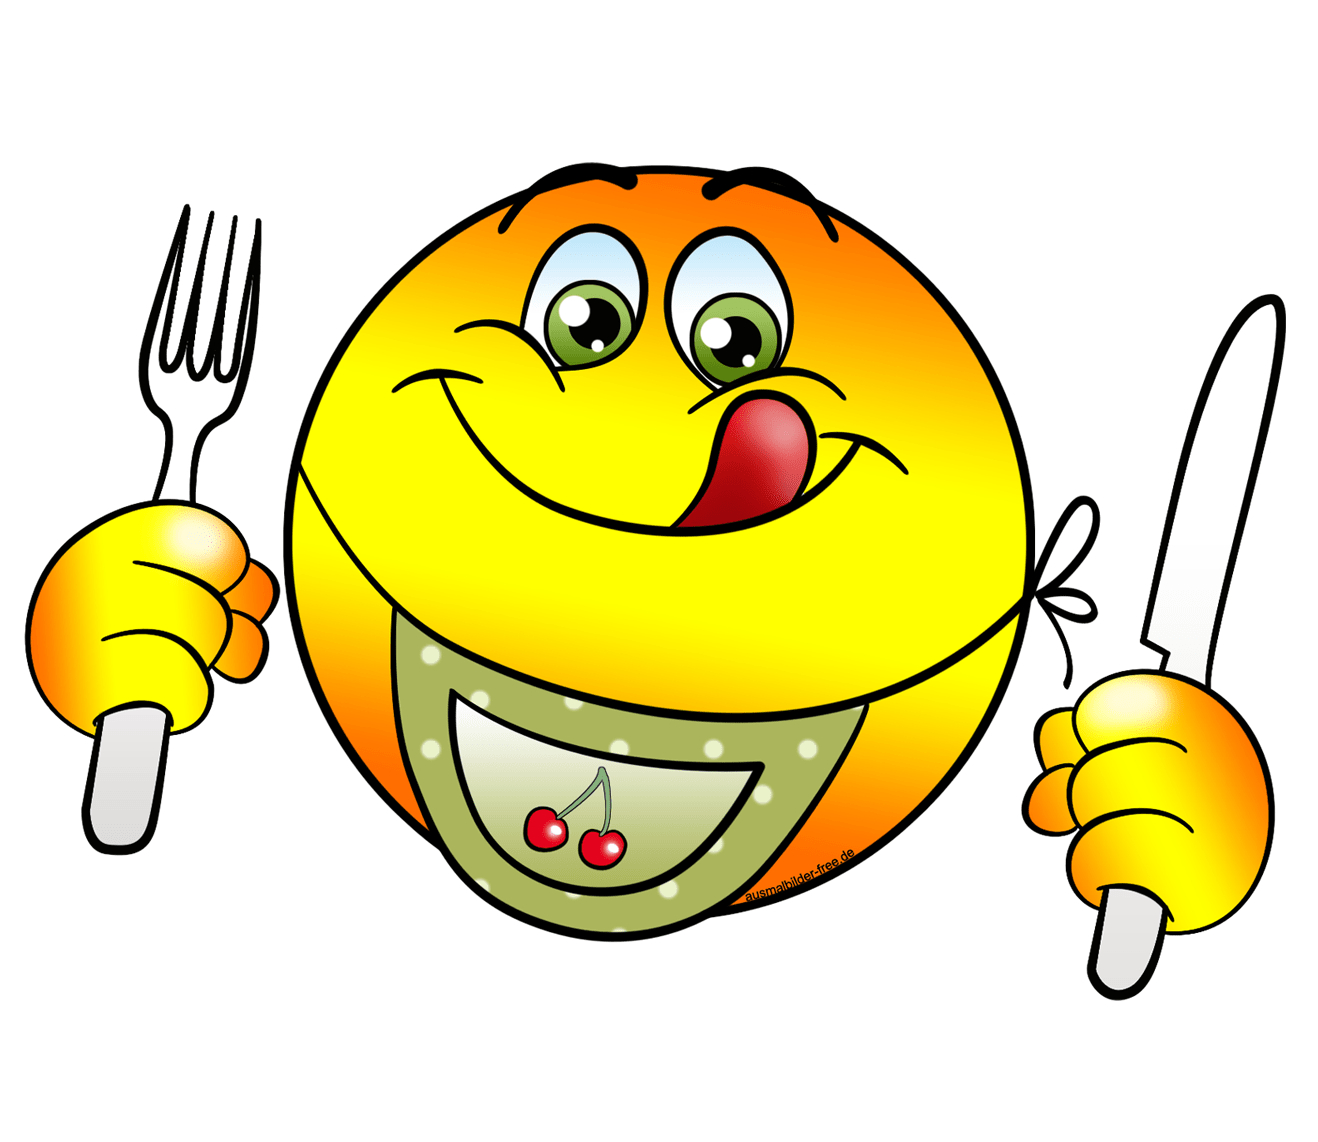 Gratis Essen